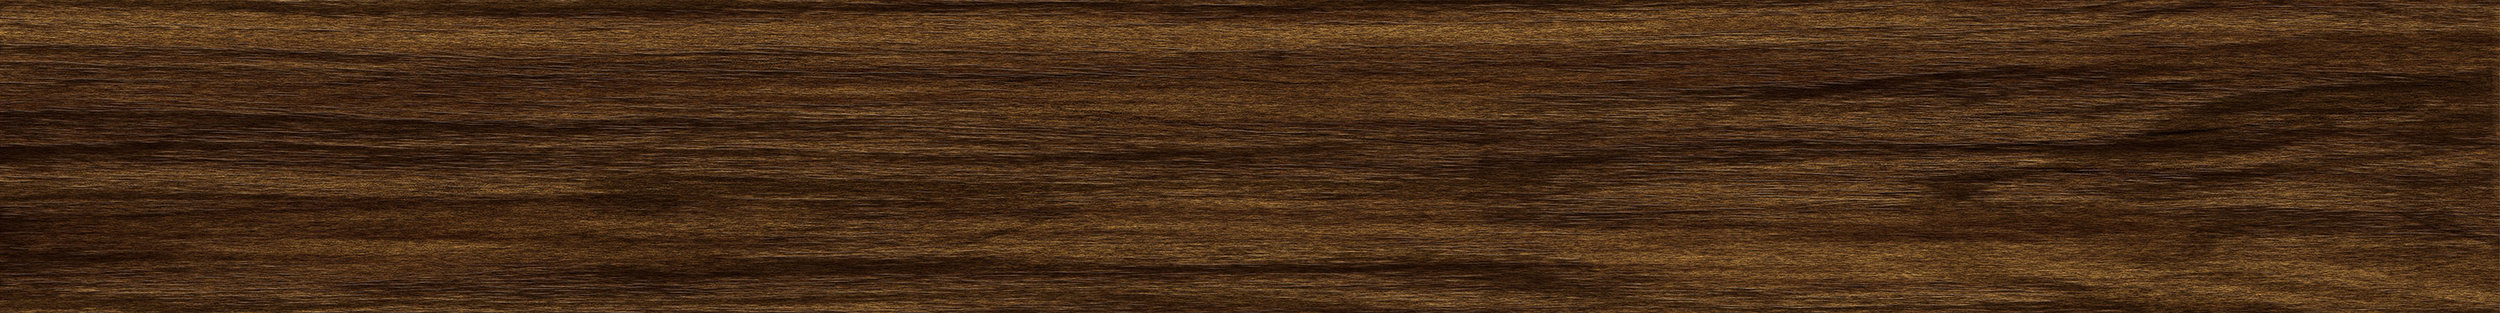 Coastal Oak Plank.jpg